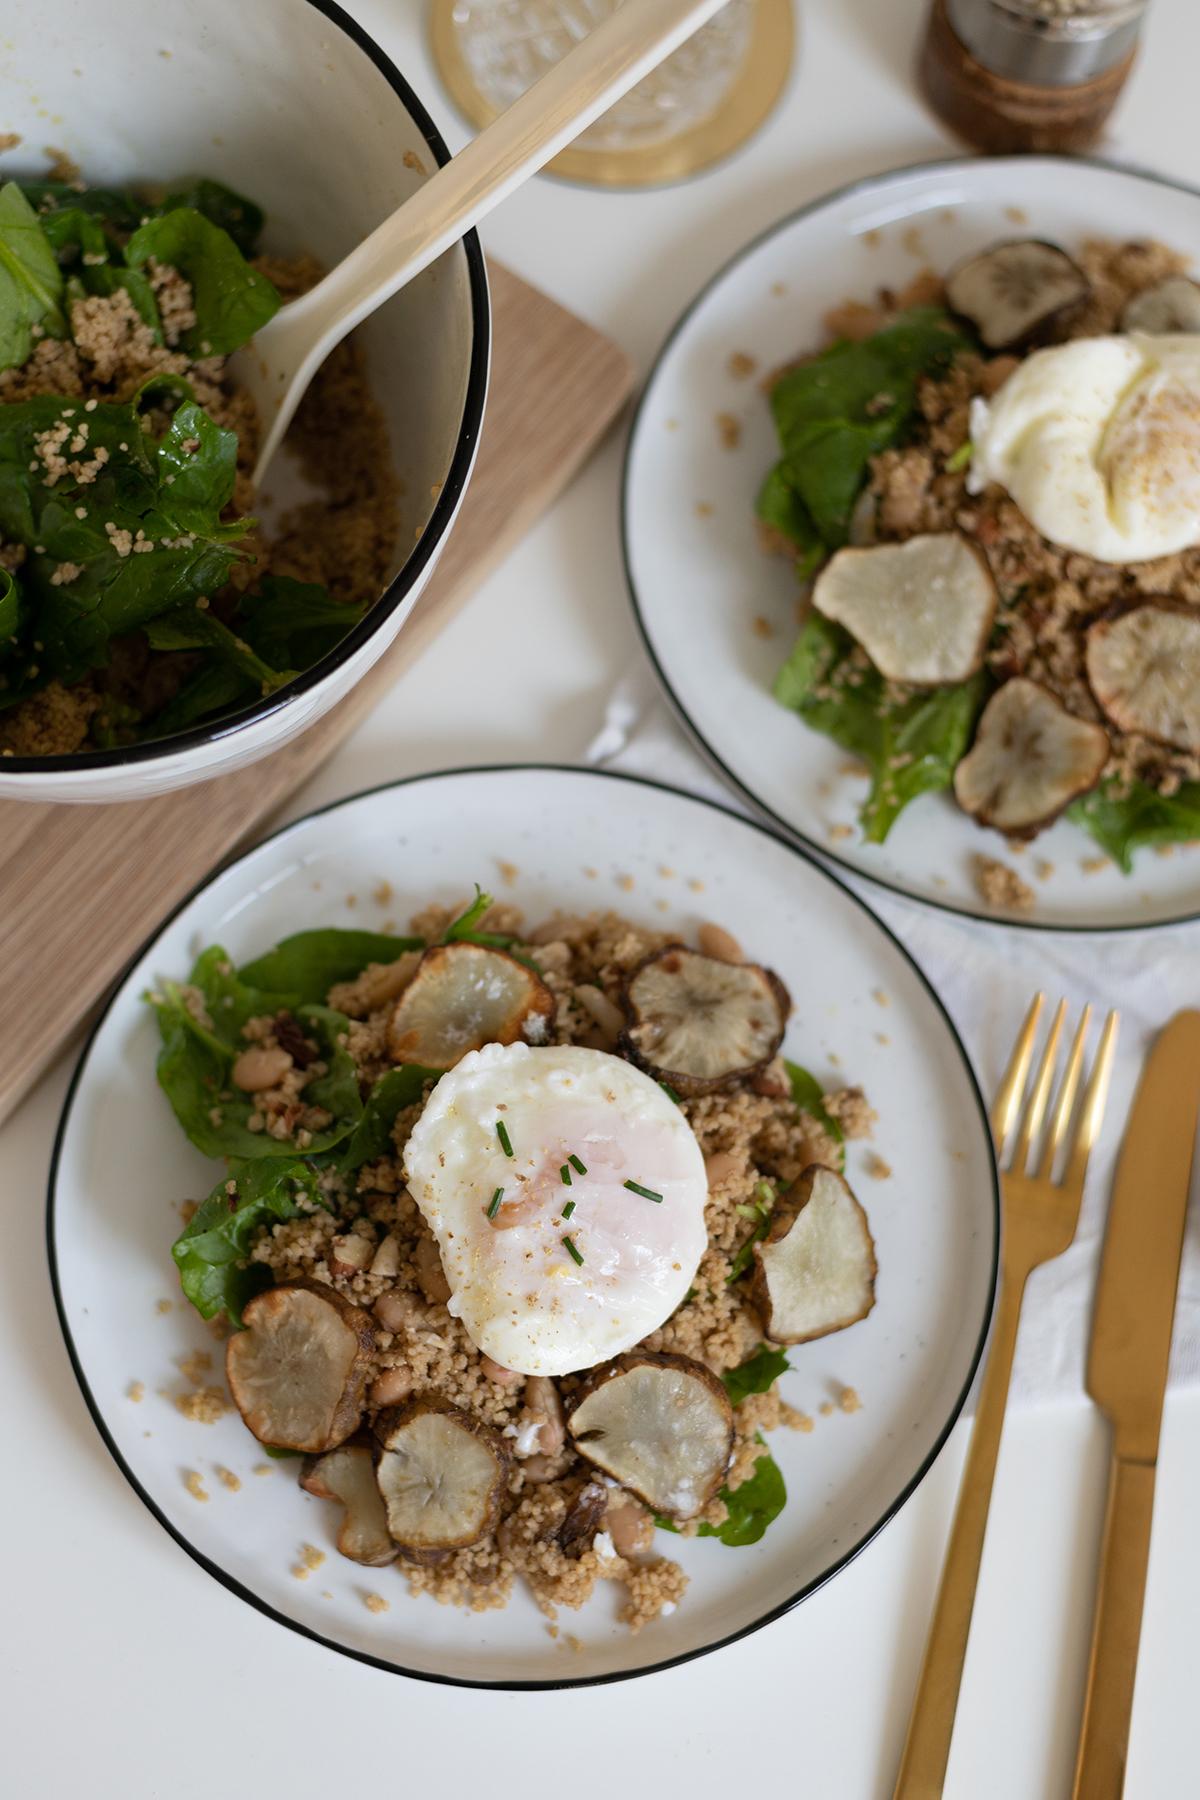 Topinambur-Spinat-Couscous-Salat | we love handmade